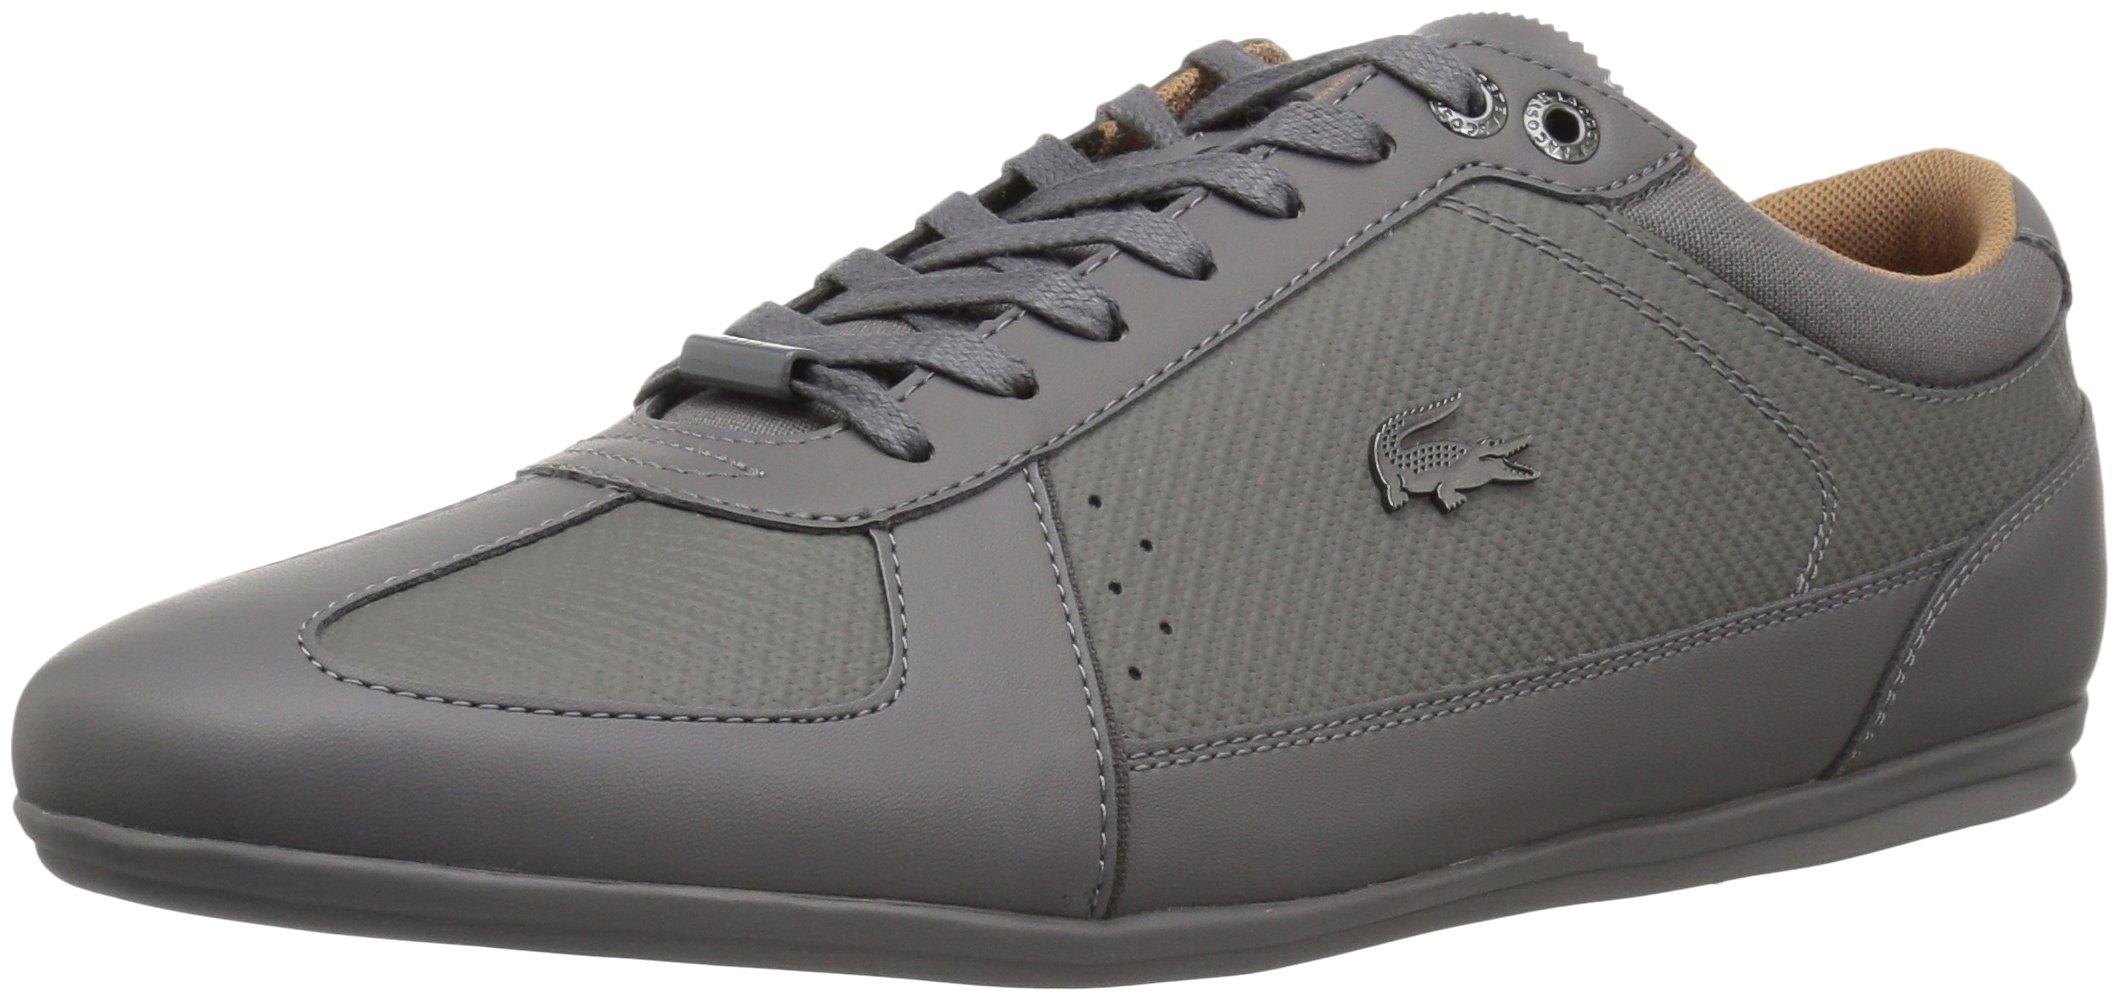 Lacoste Men's Evara 118 2 Sneaker, DKGRY/DKGRY, 7.5 M US